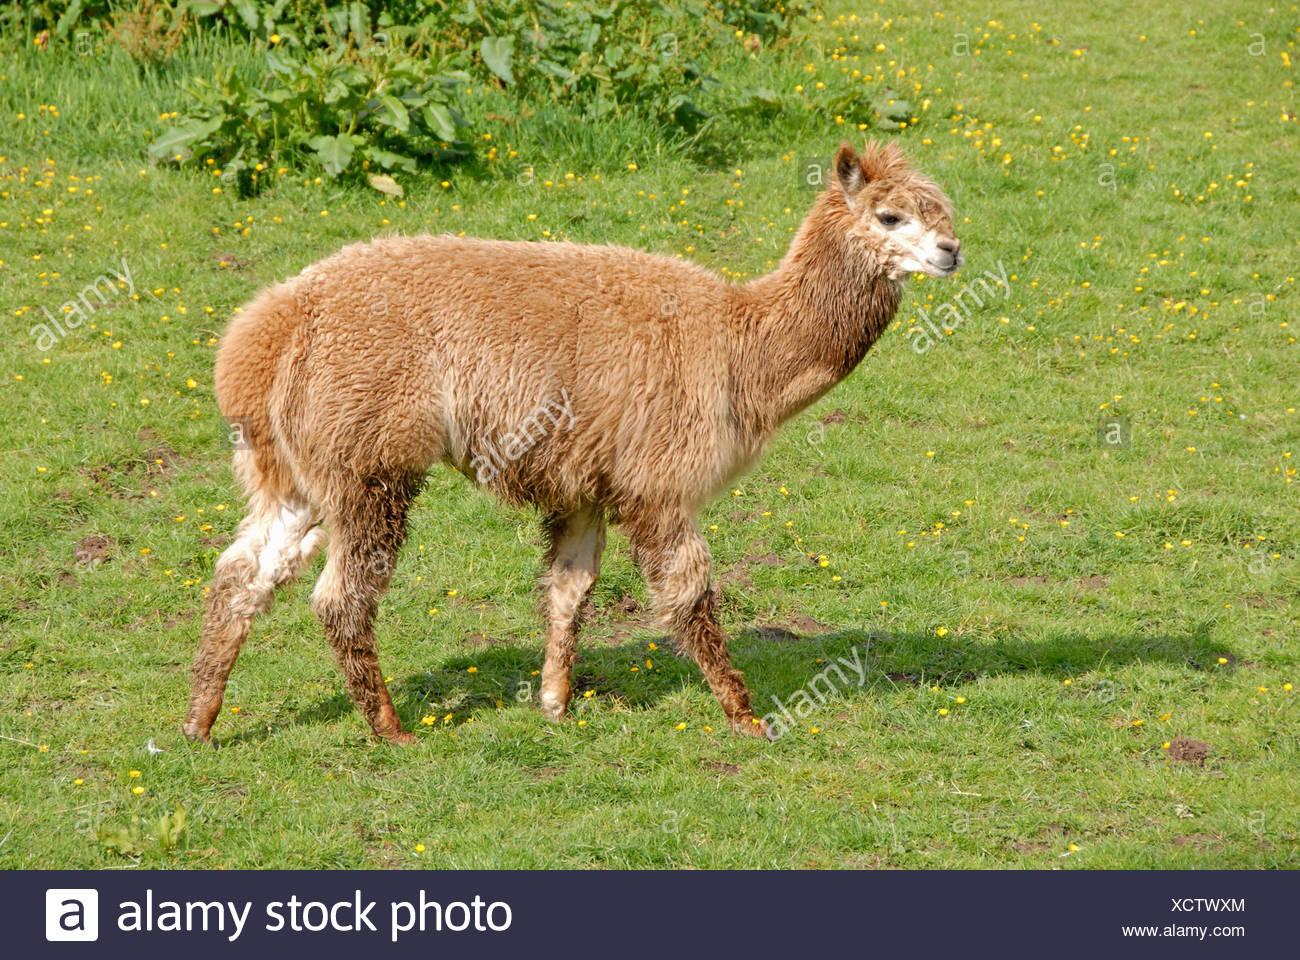 Alpaca domestic grass pet wool herbivore buttercups lama pacos alpaca alpacas camelidae domestic domesticated hoofed herbivore - Stock Image